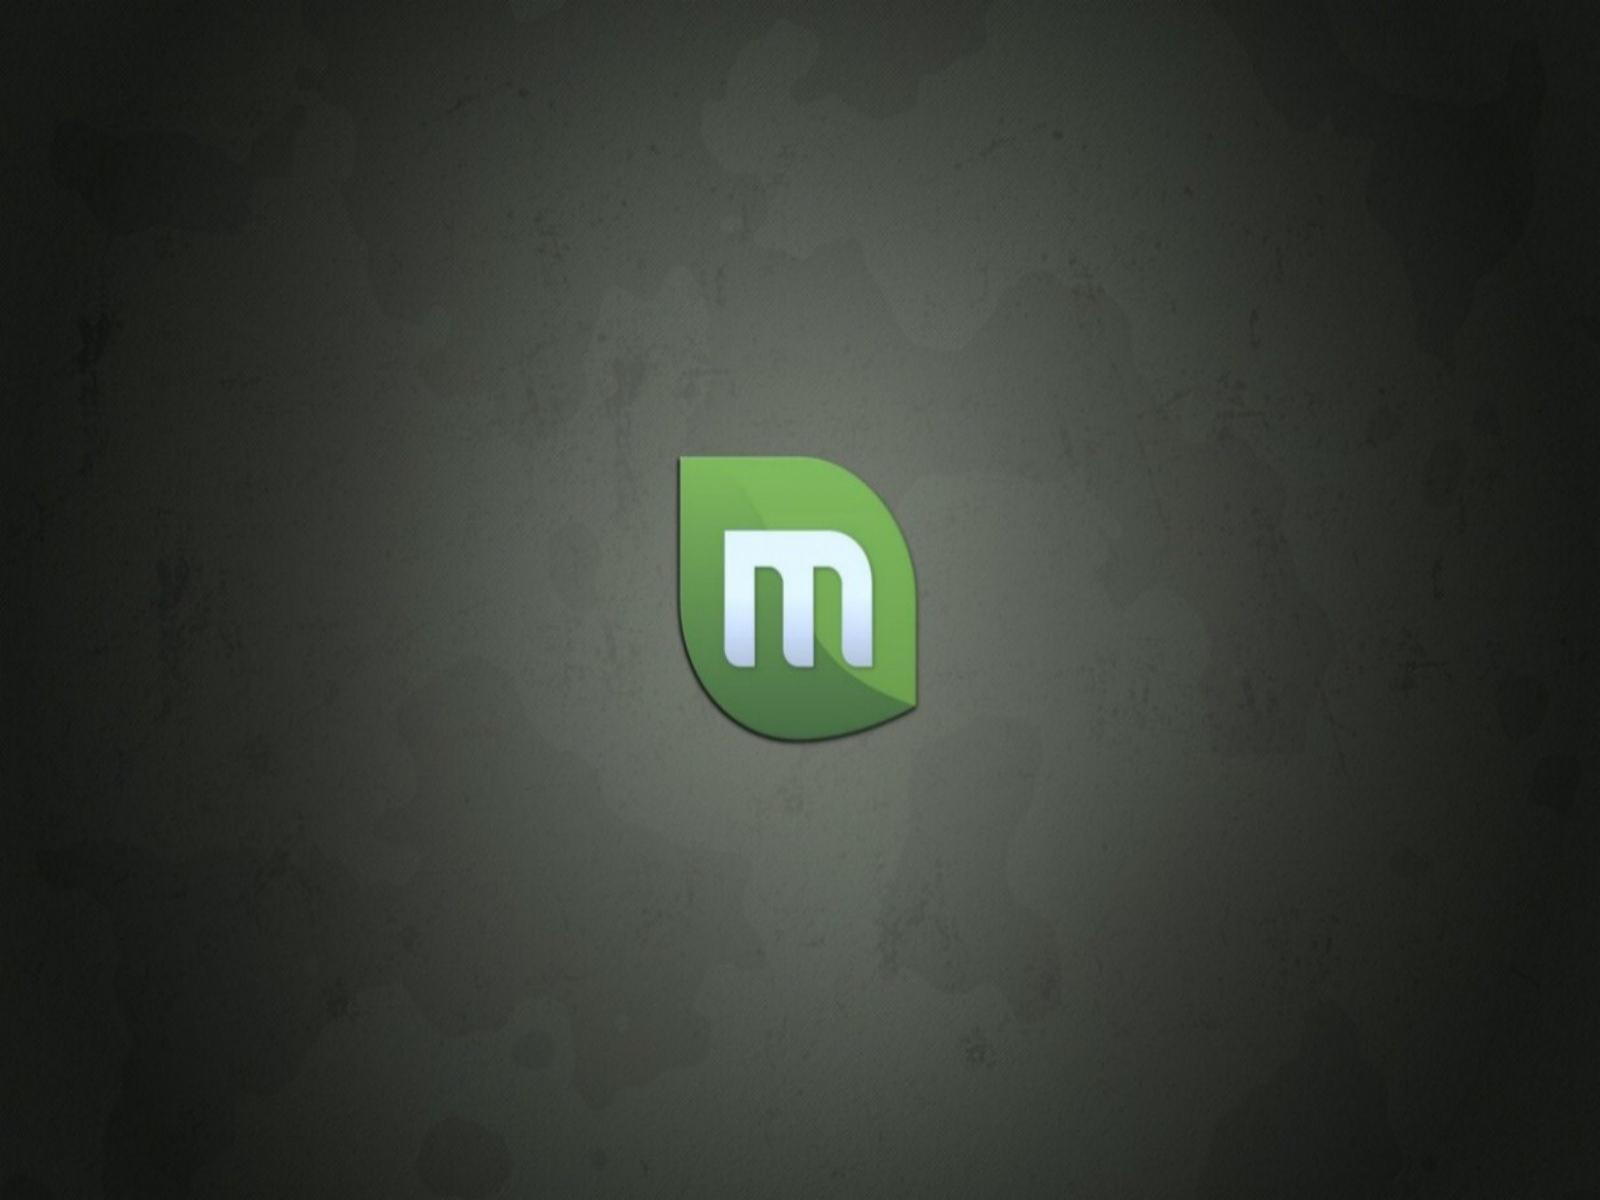 Linux Mint Katya KDE HD Wallpapers Linux Mint Background   1600x1200 1600x1200